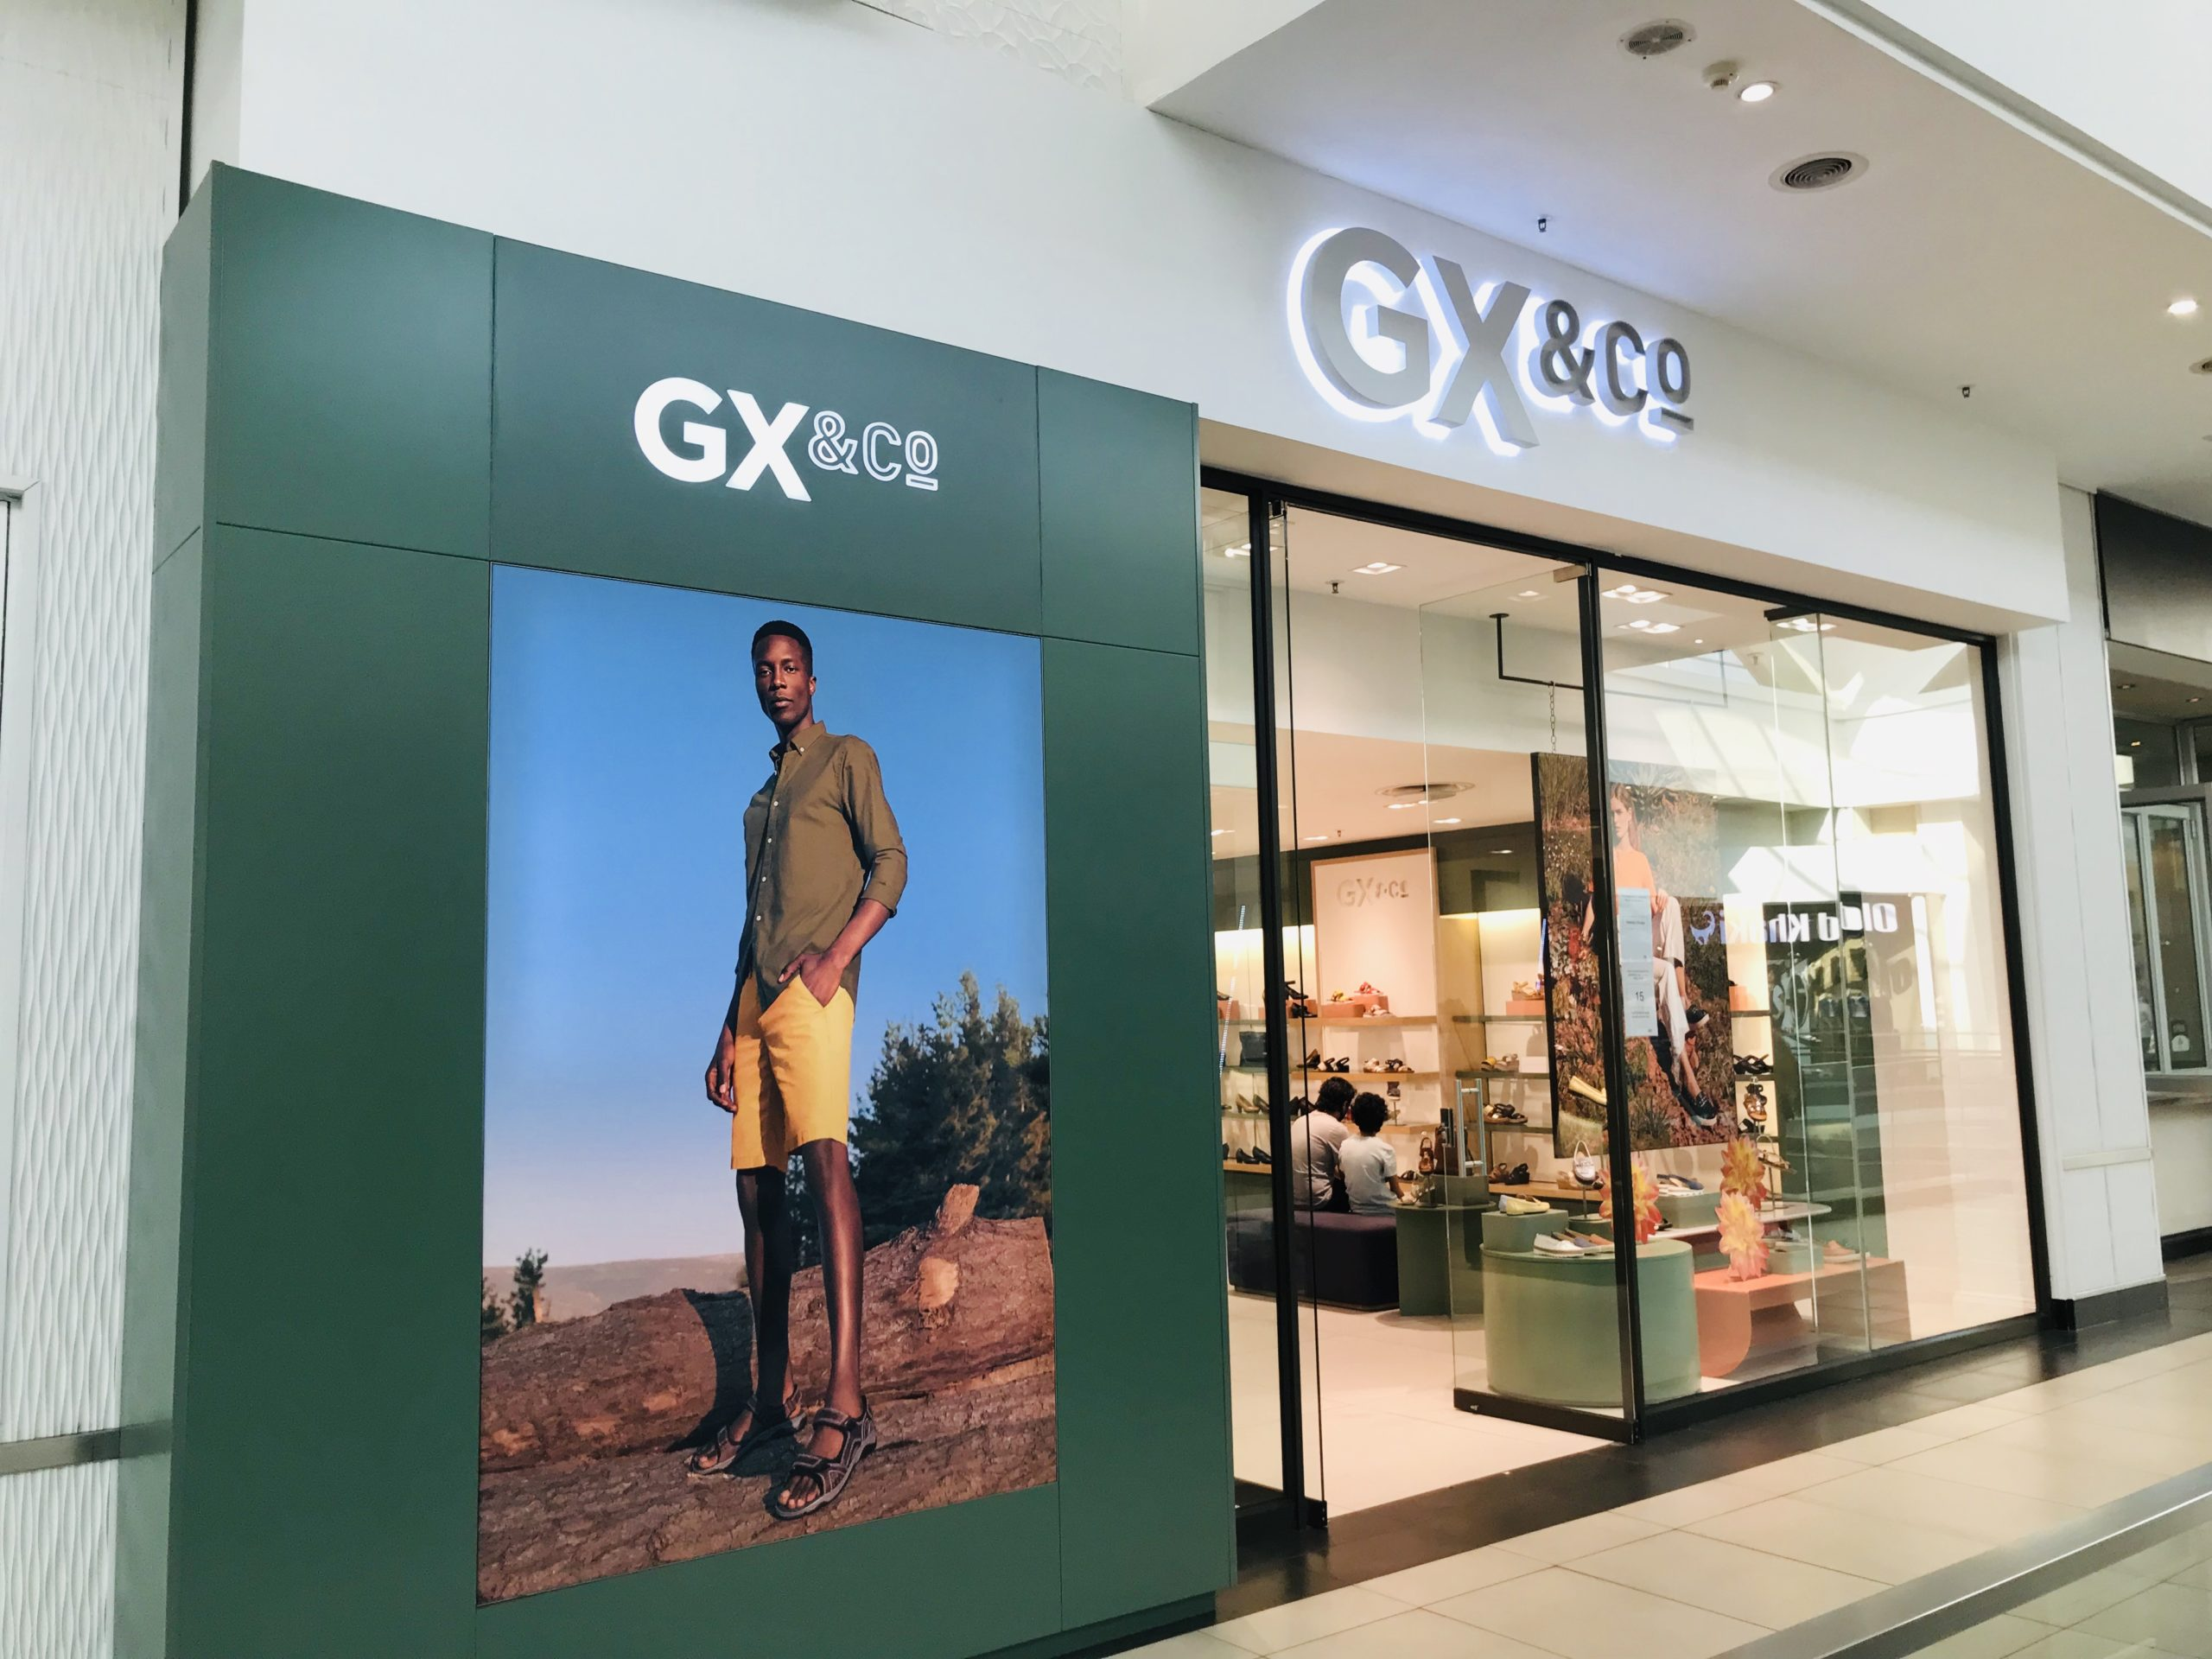 GX & Co. (Previously Green Cross)